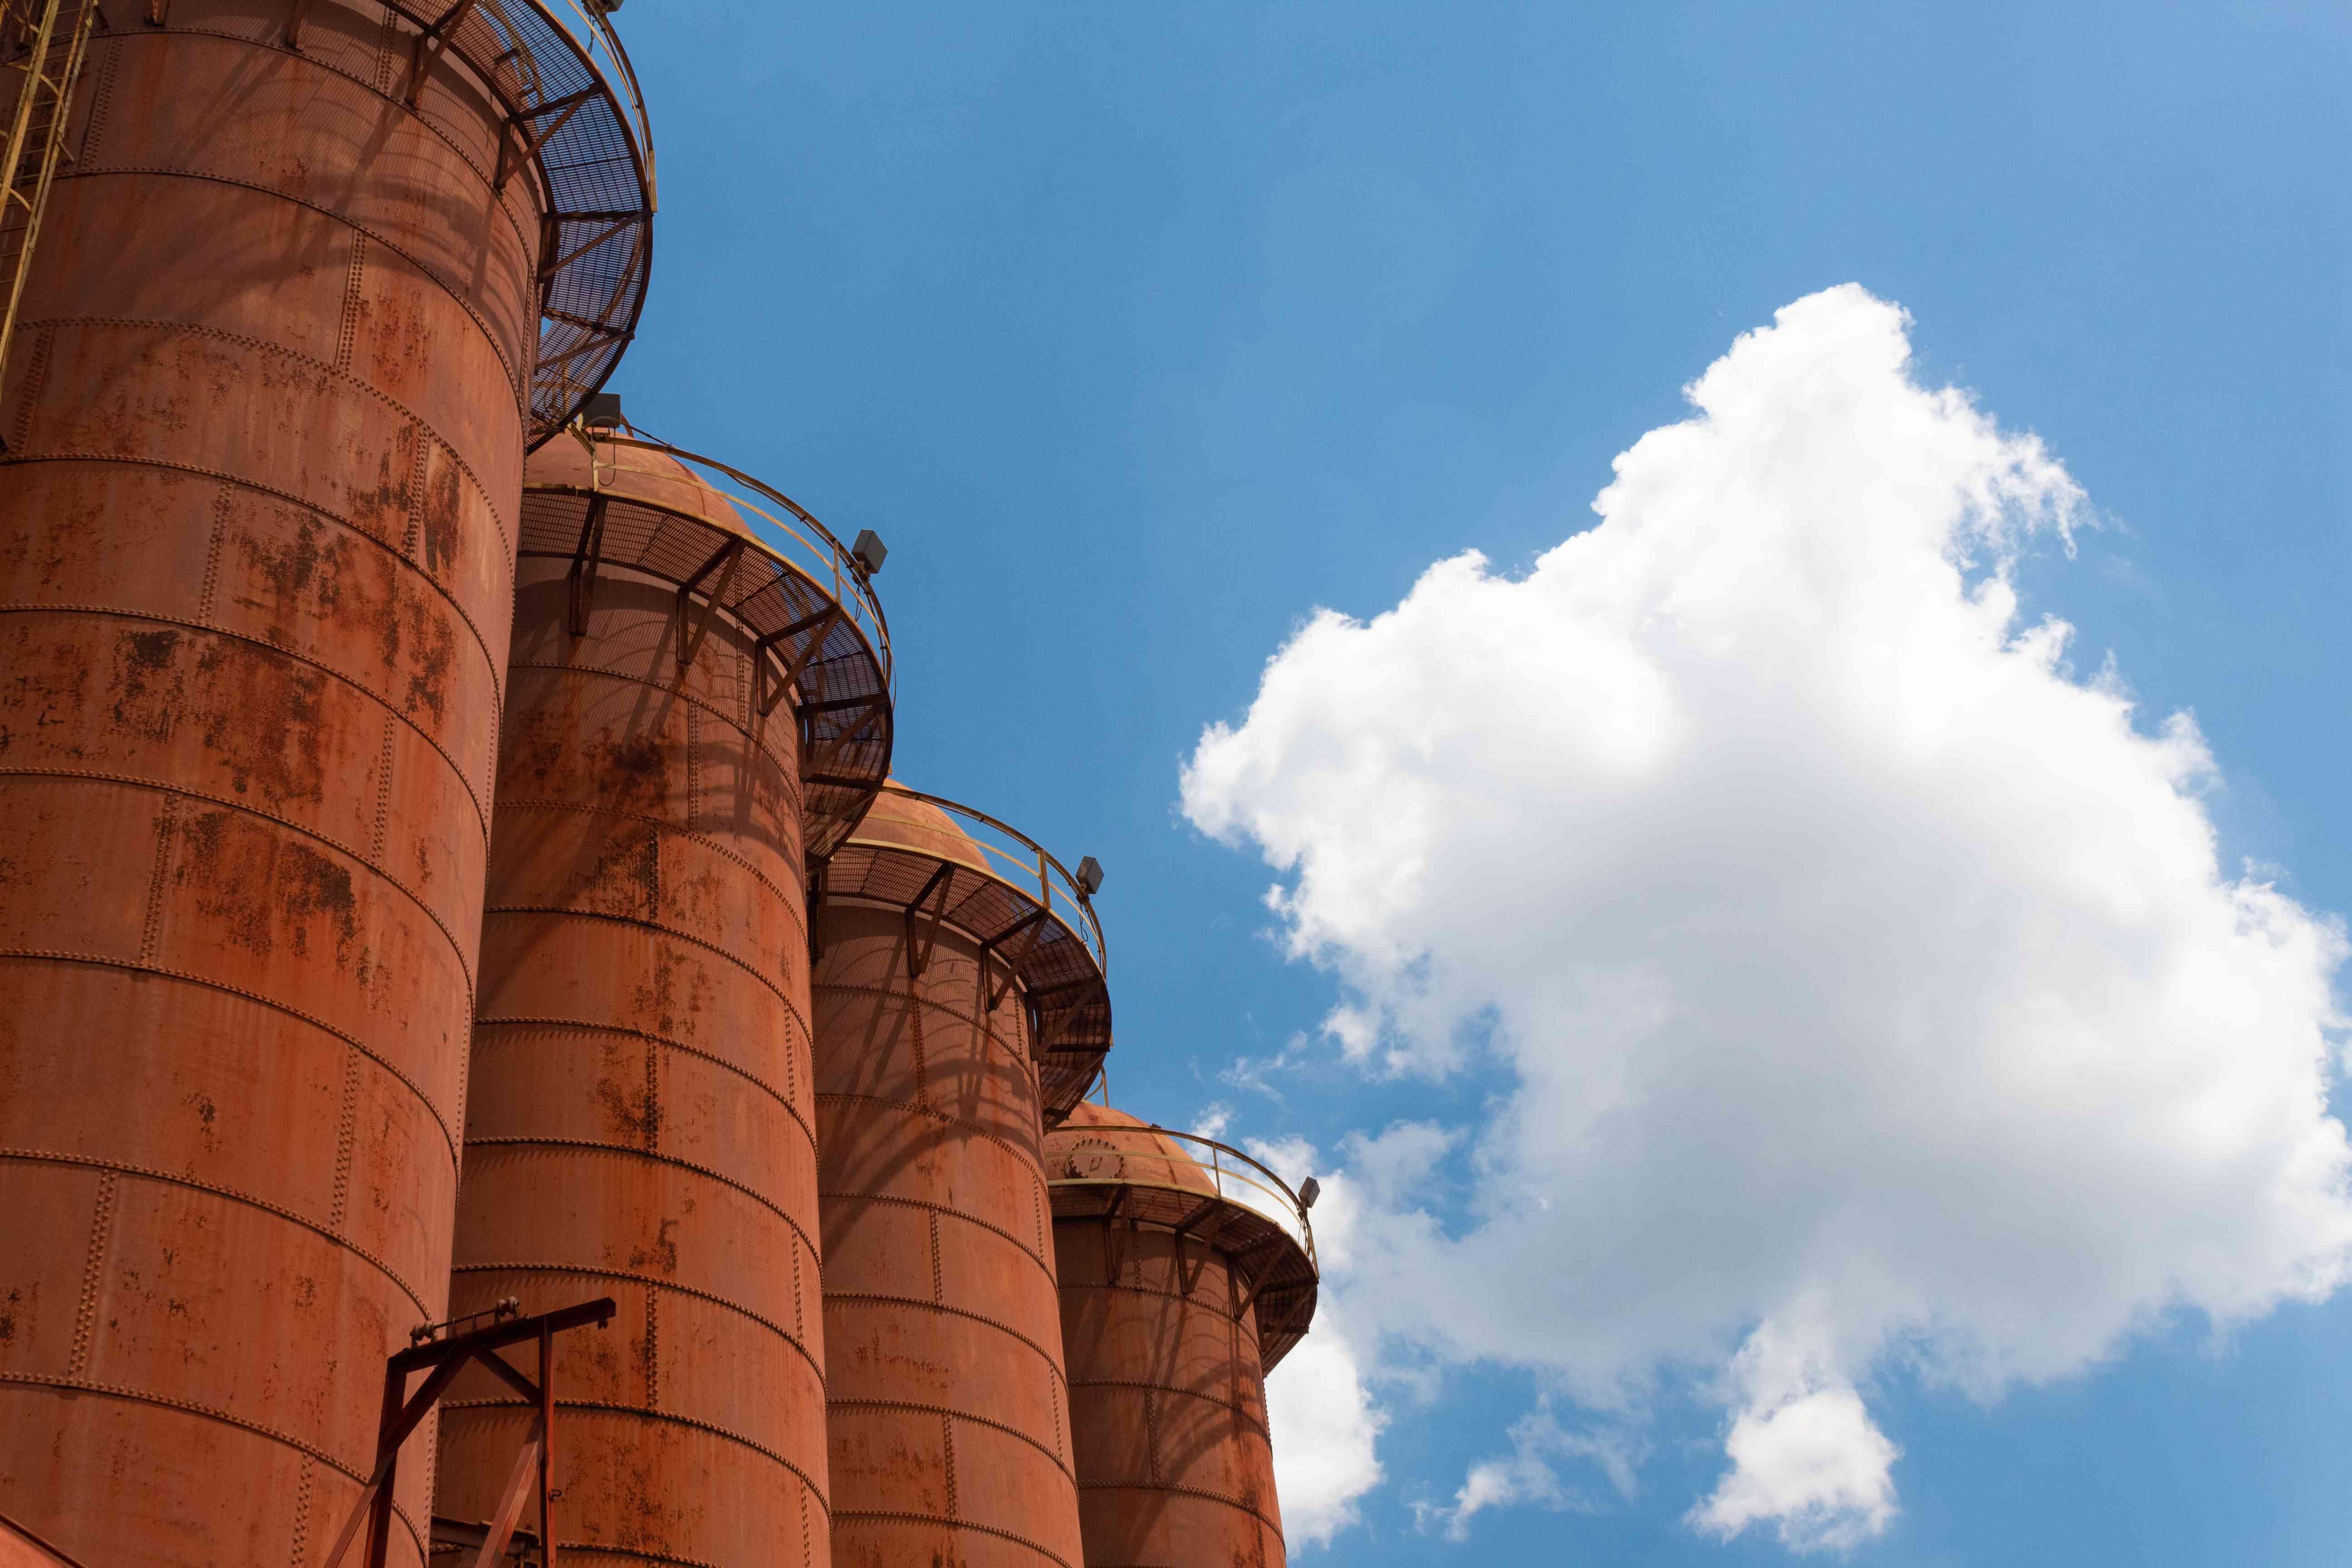 Sloss Furnaces National Historic Landmark, Birmingham Alabama USA, row of rusting blast furnaces against a brilliant blue sky with clouds, creative copy space